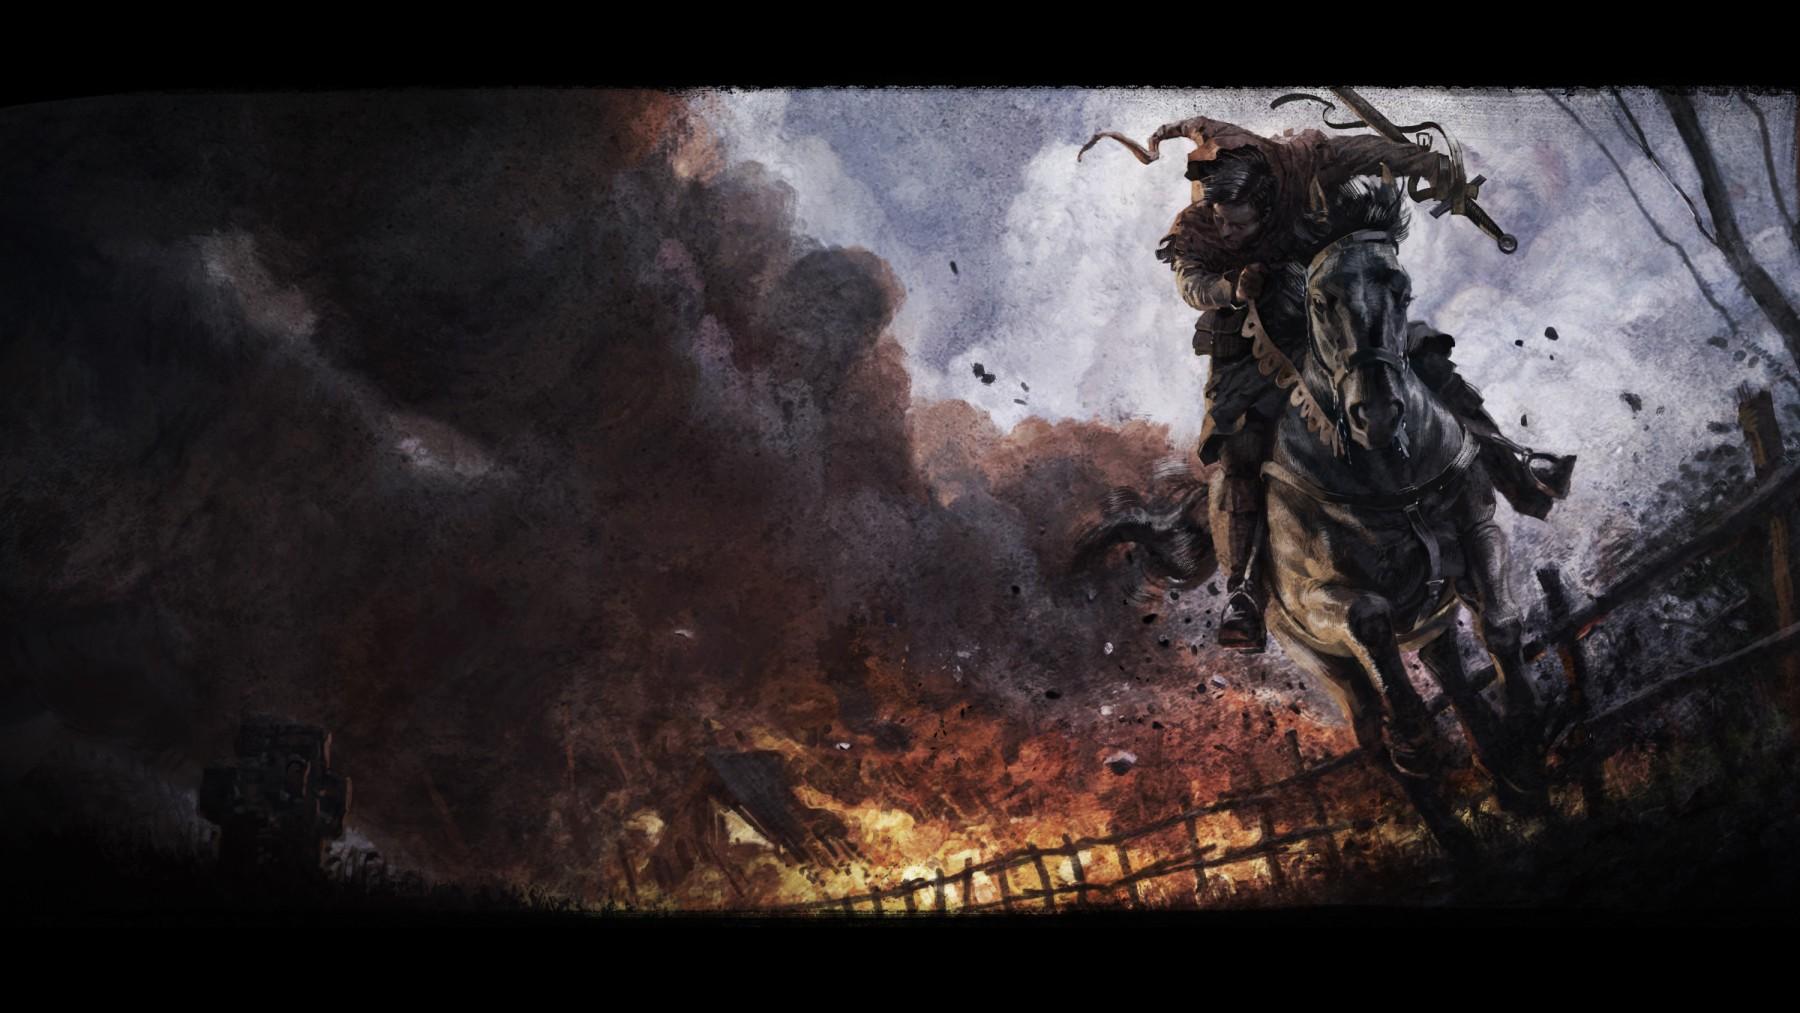 Kingdom Come: Deliverance ожидает 4 сюжетных дополнения